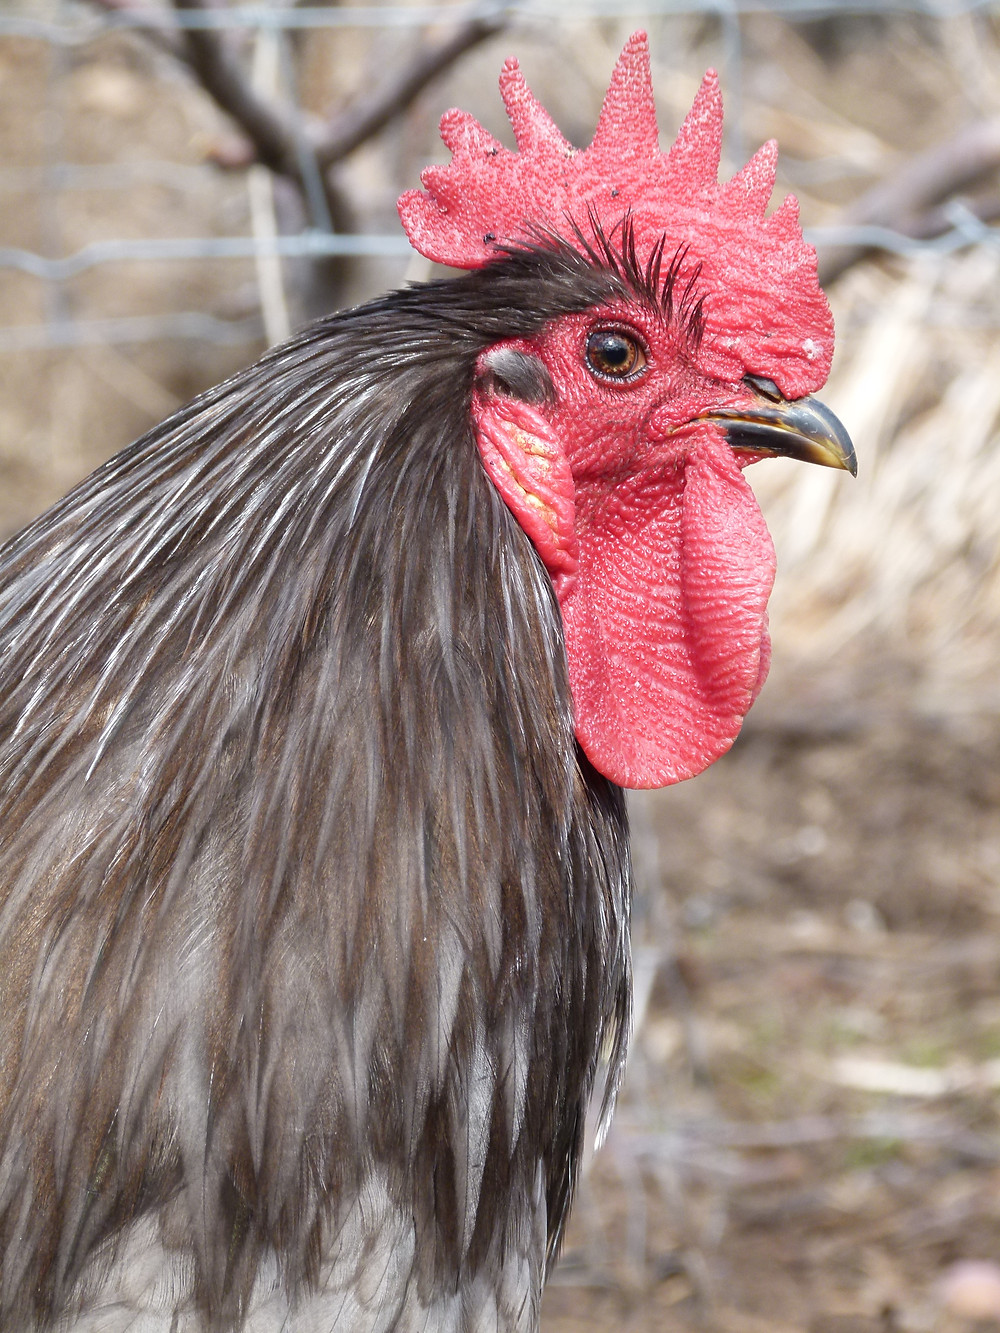 Blue Australorp rooster